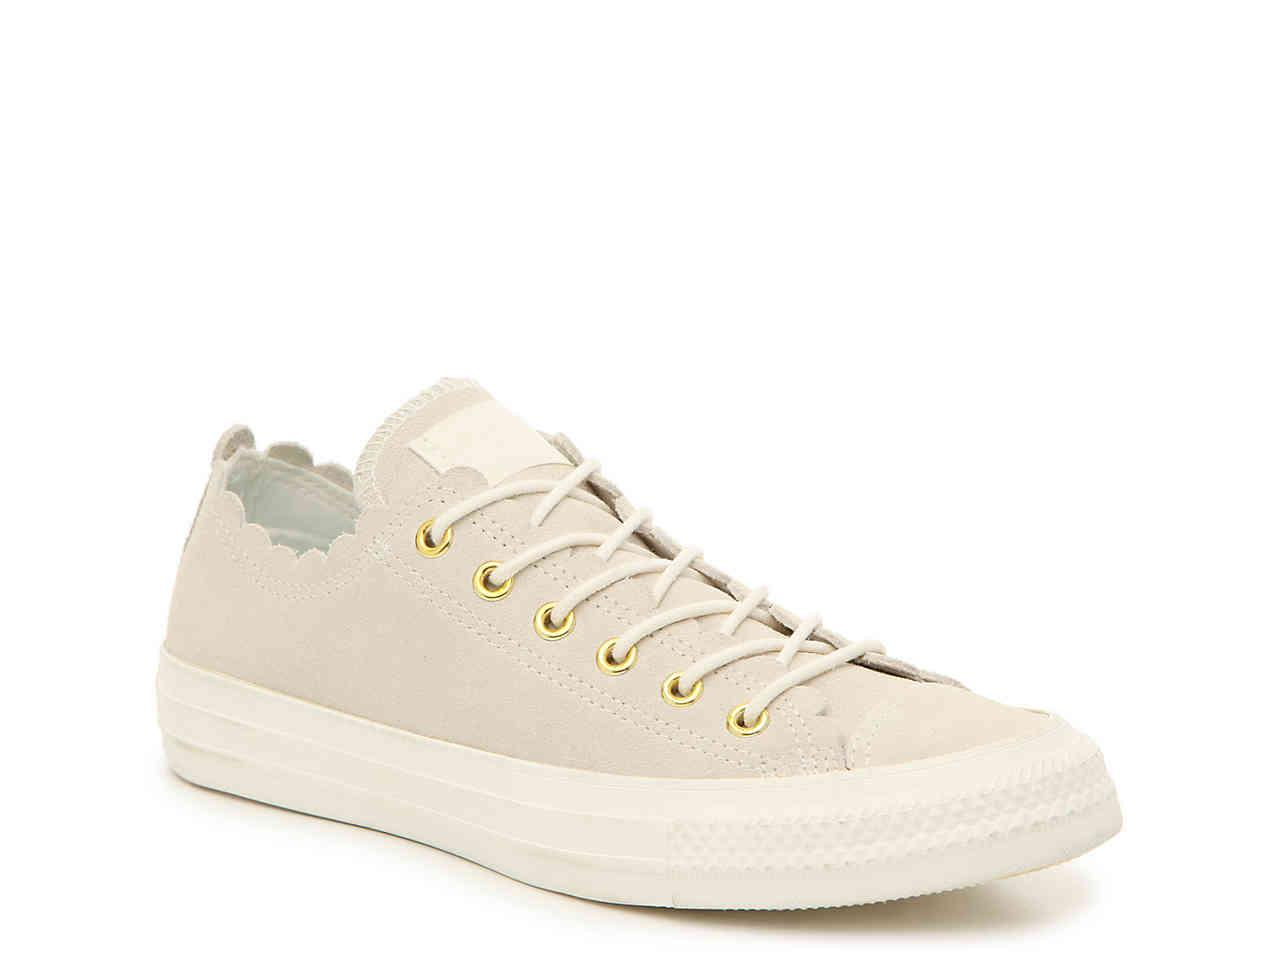 ba2332c870 Converse Chuck Taylor All Star Scallop Sneaker in White - Lyst